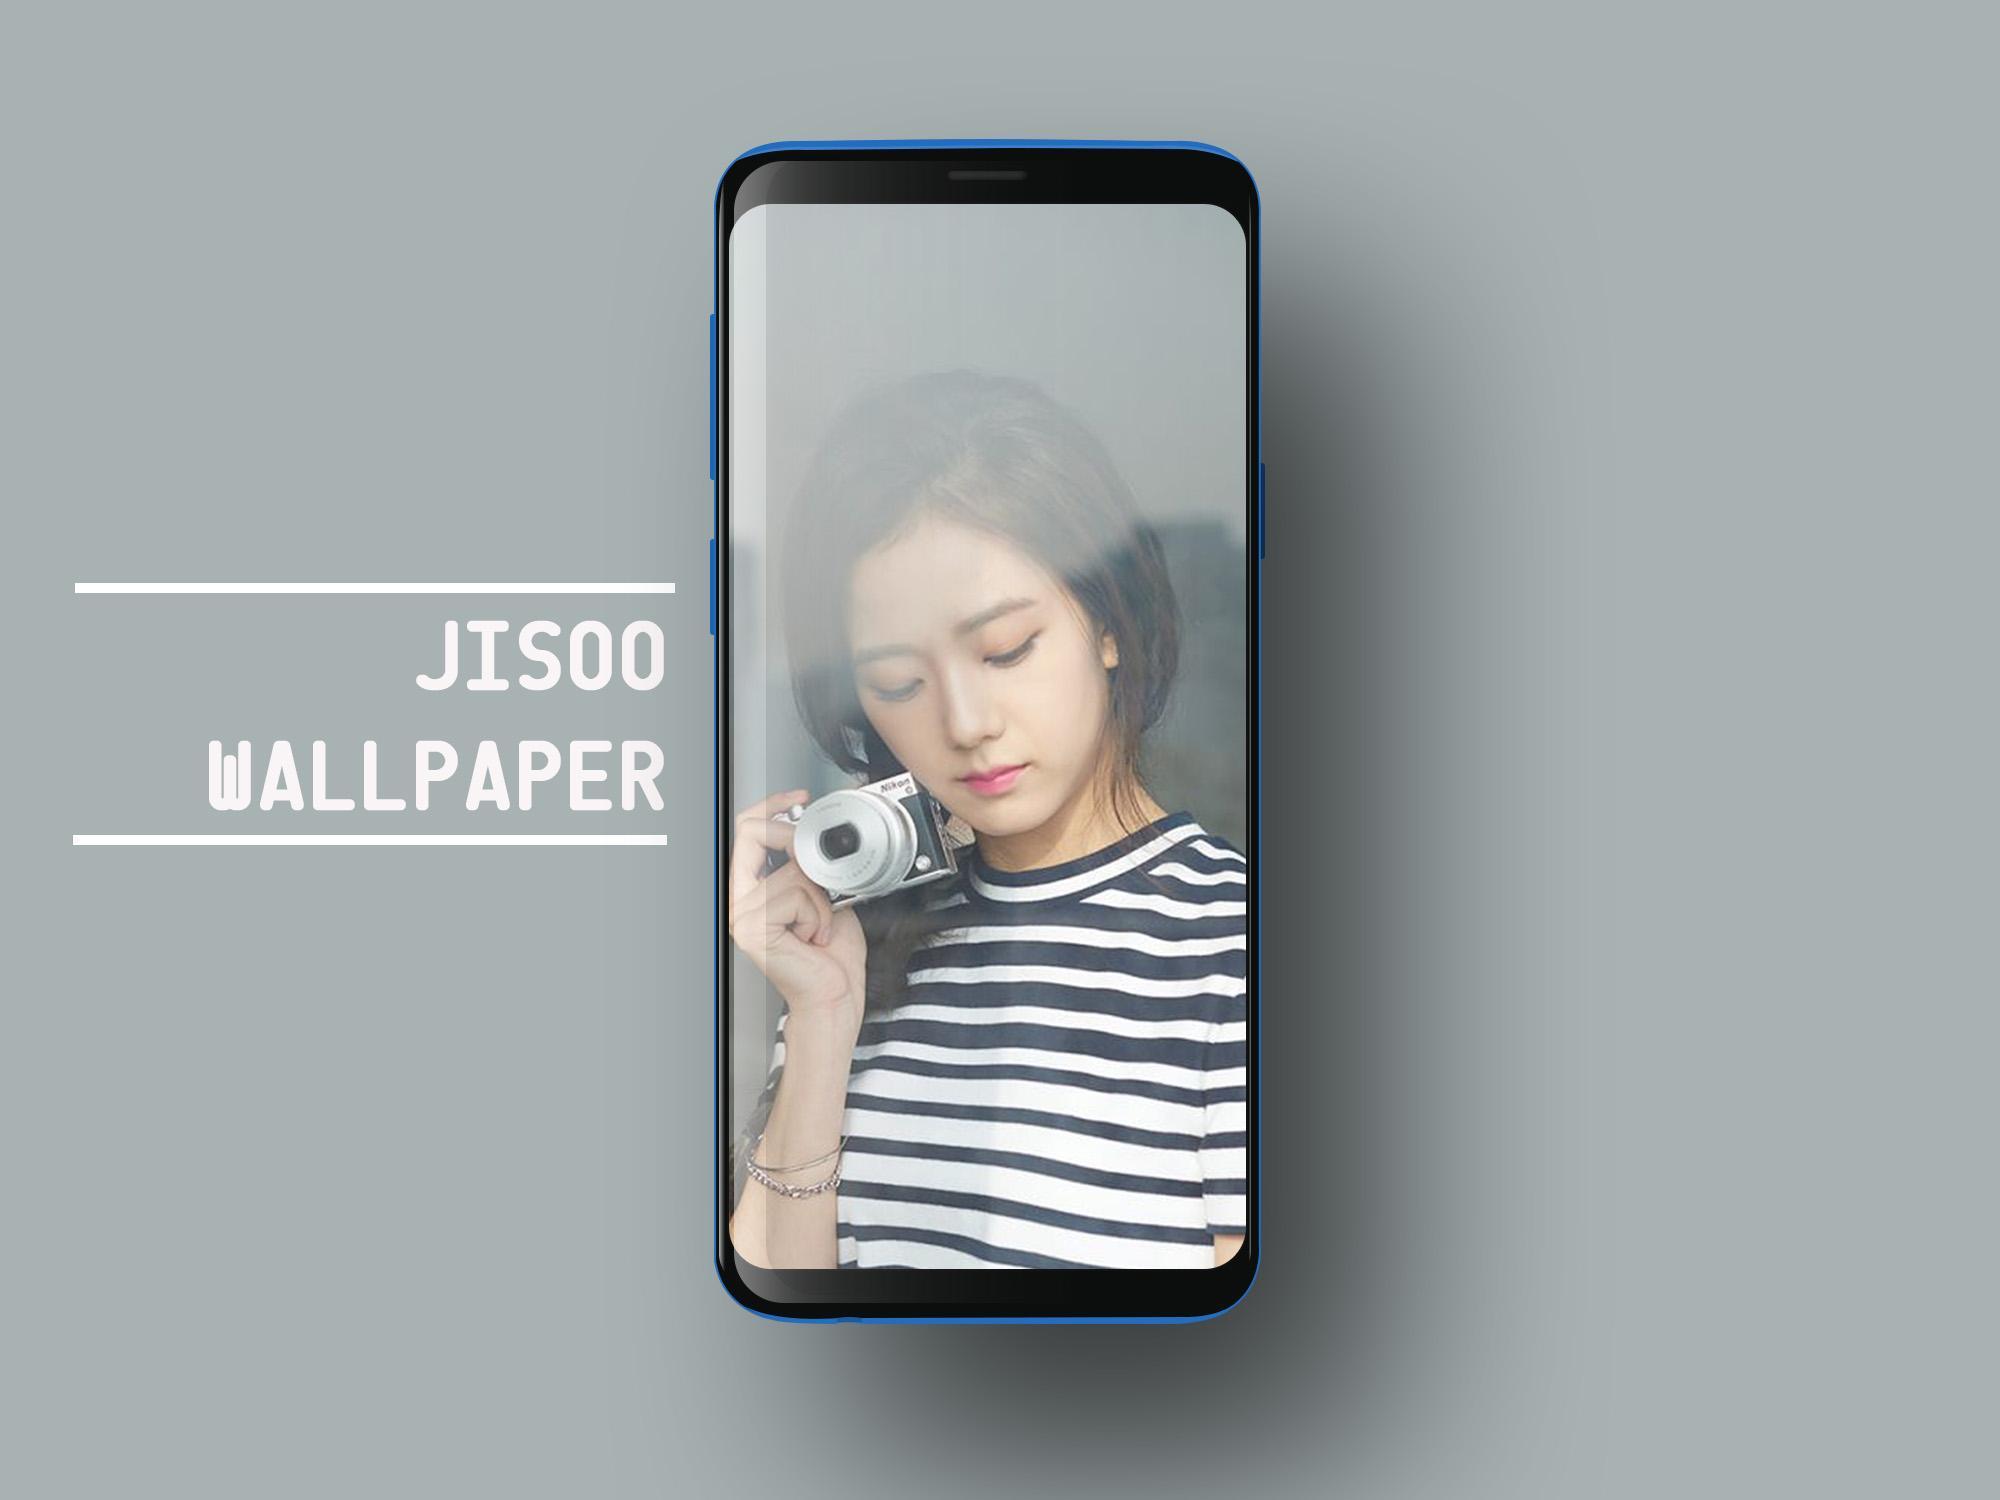 Blackpink Jisoo Wallpaper Kpop Fans Hd For Android Apk Download